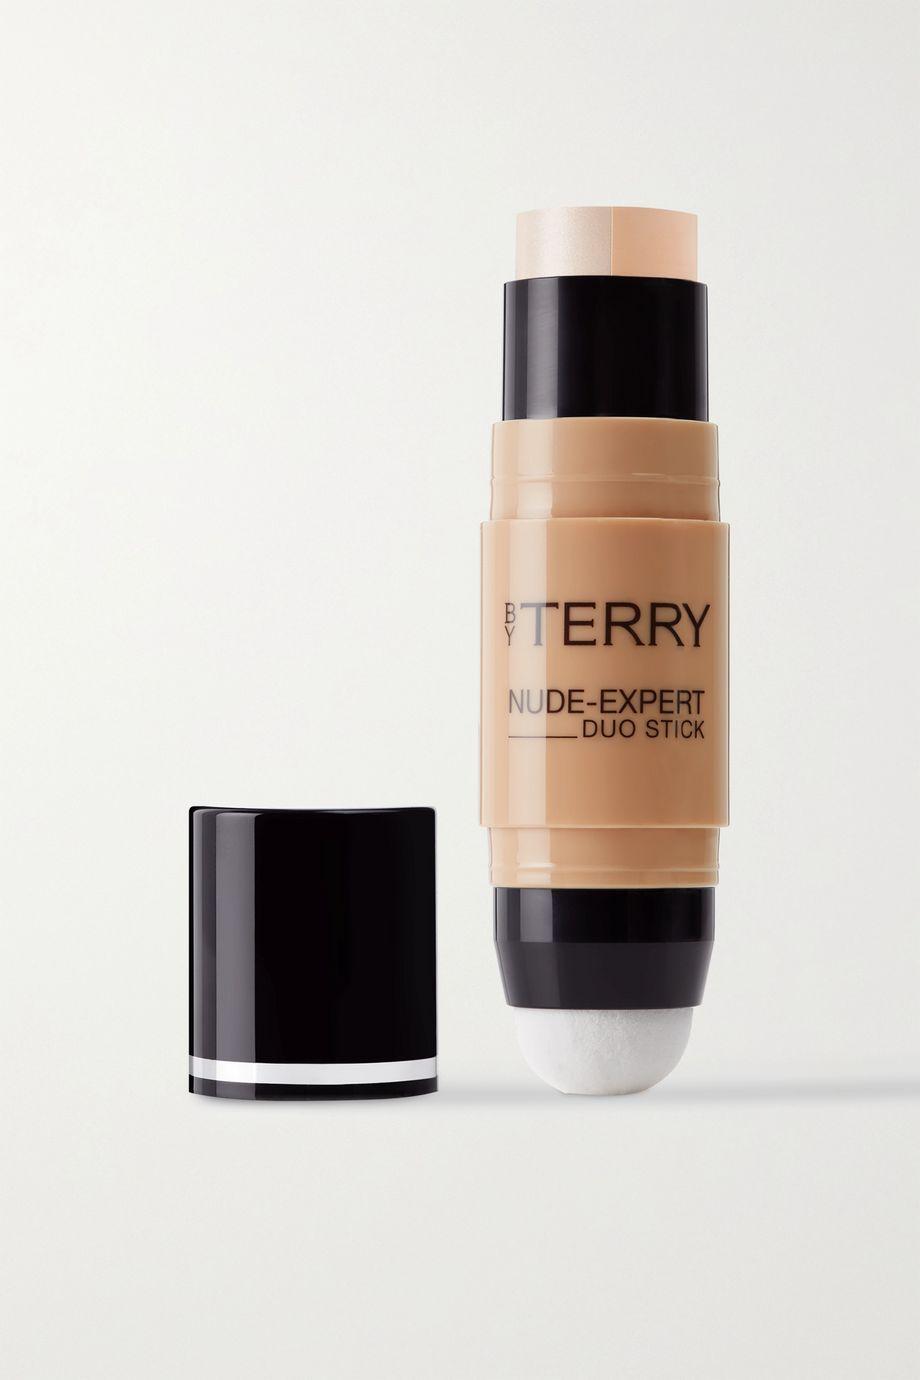 BY TERRY Fond de teint stick deux-en-un Nude Expert, Fair Beige 1